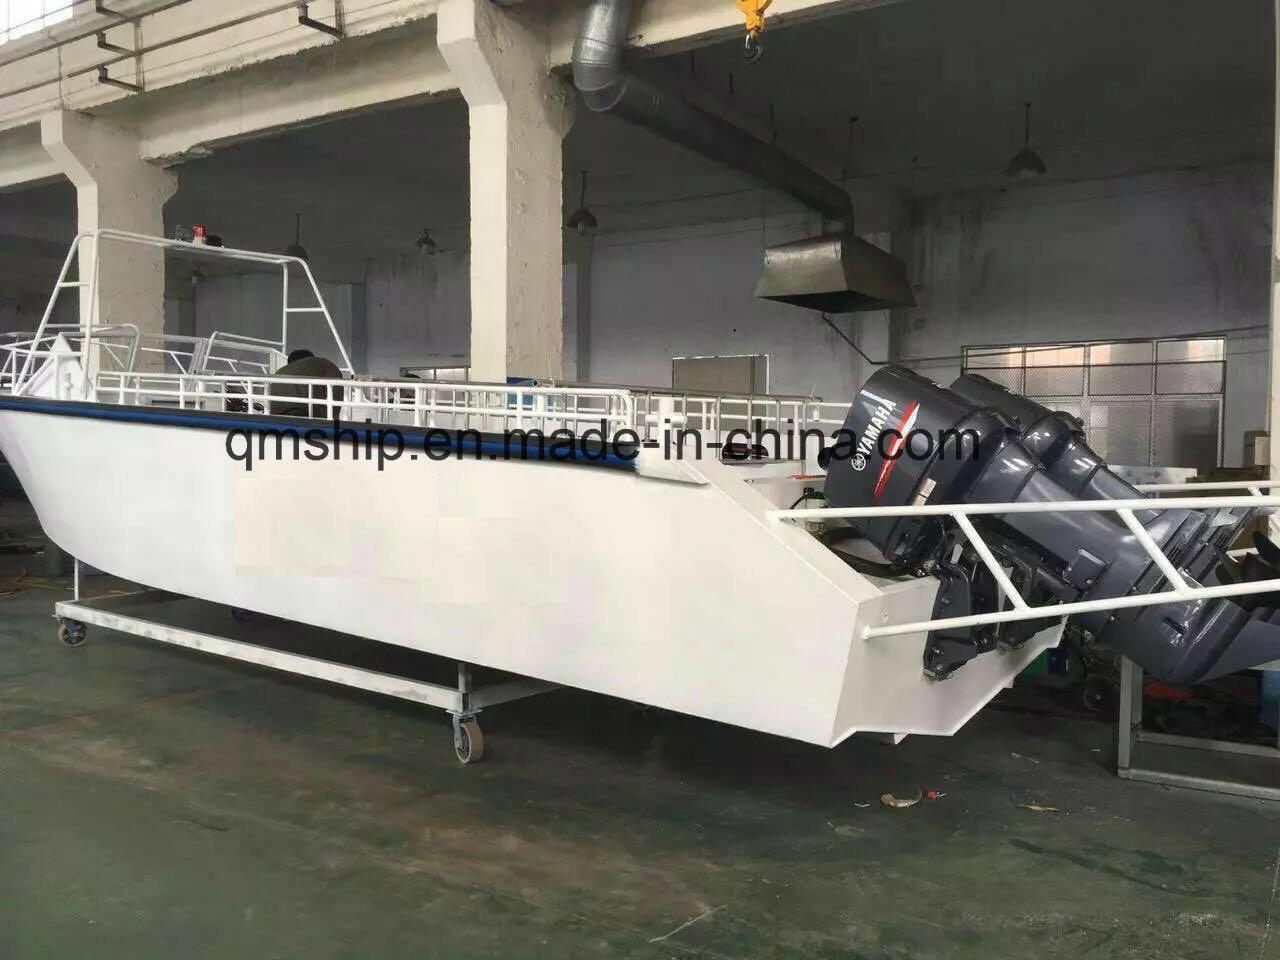 20FT 6.1m Open Top Pleasure Power Boat Qm6100